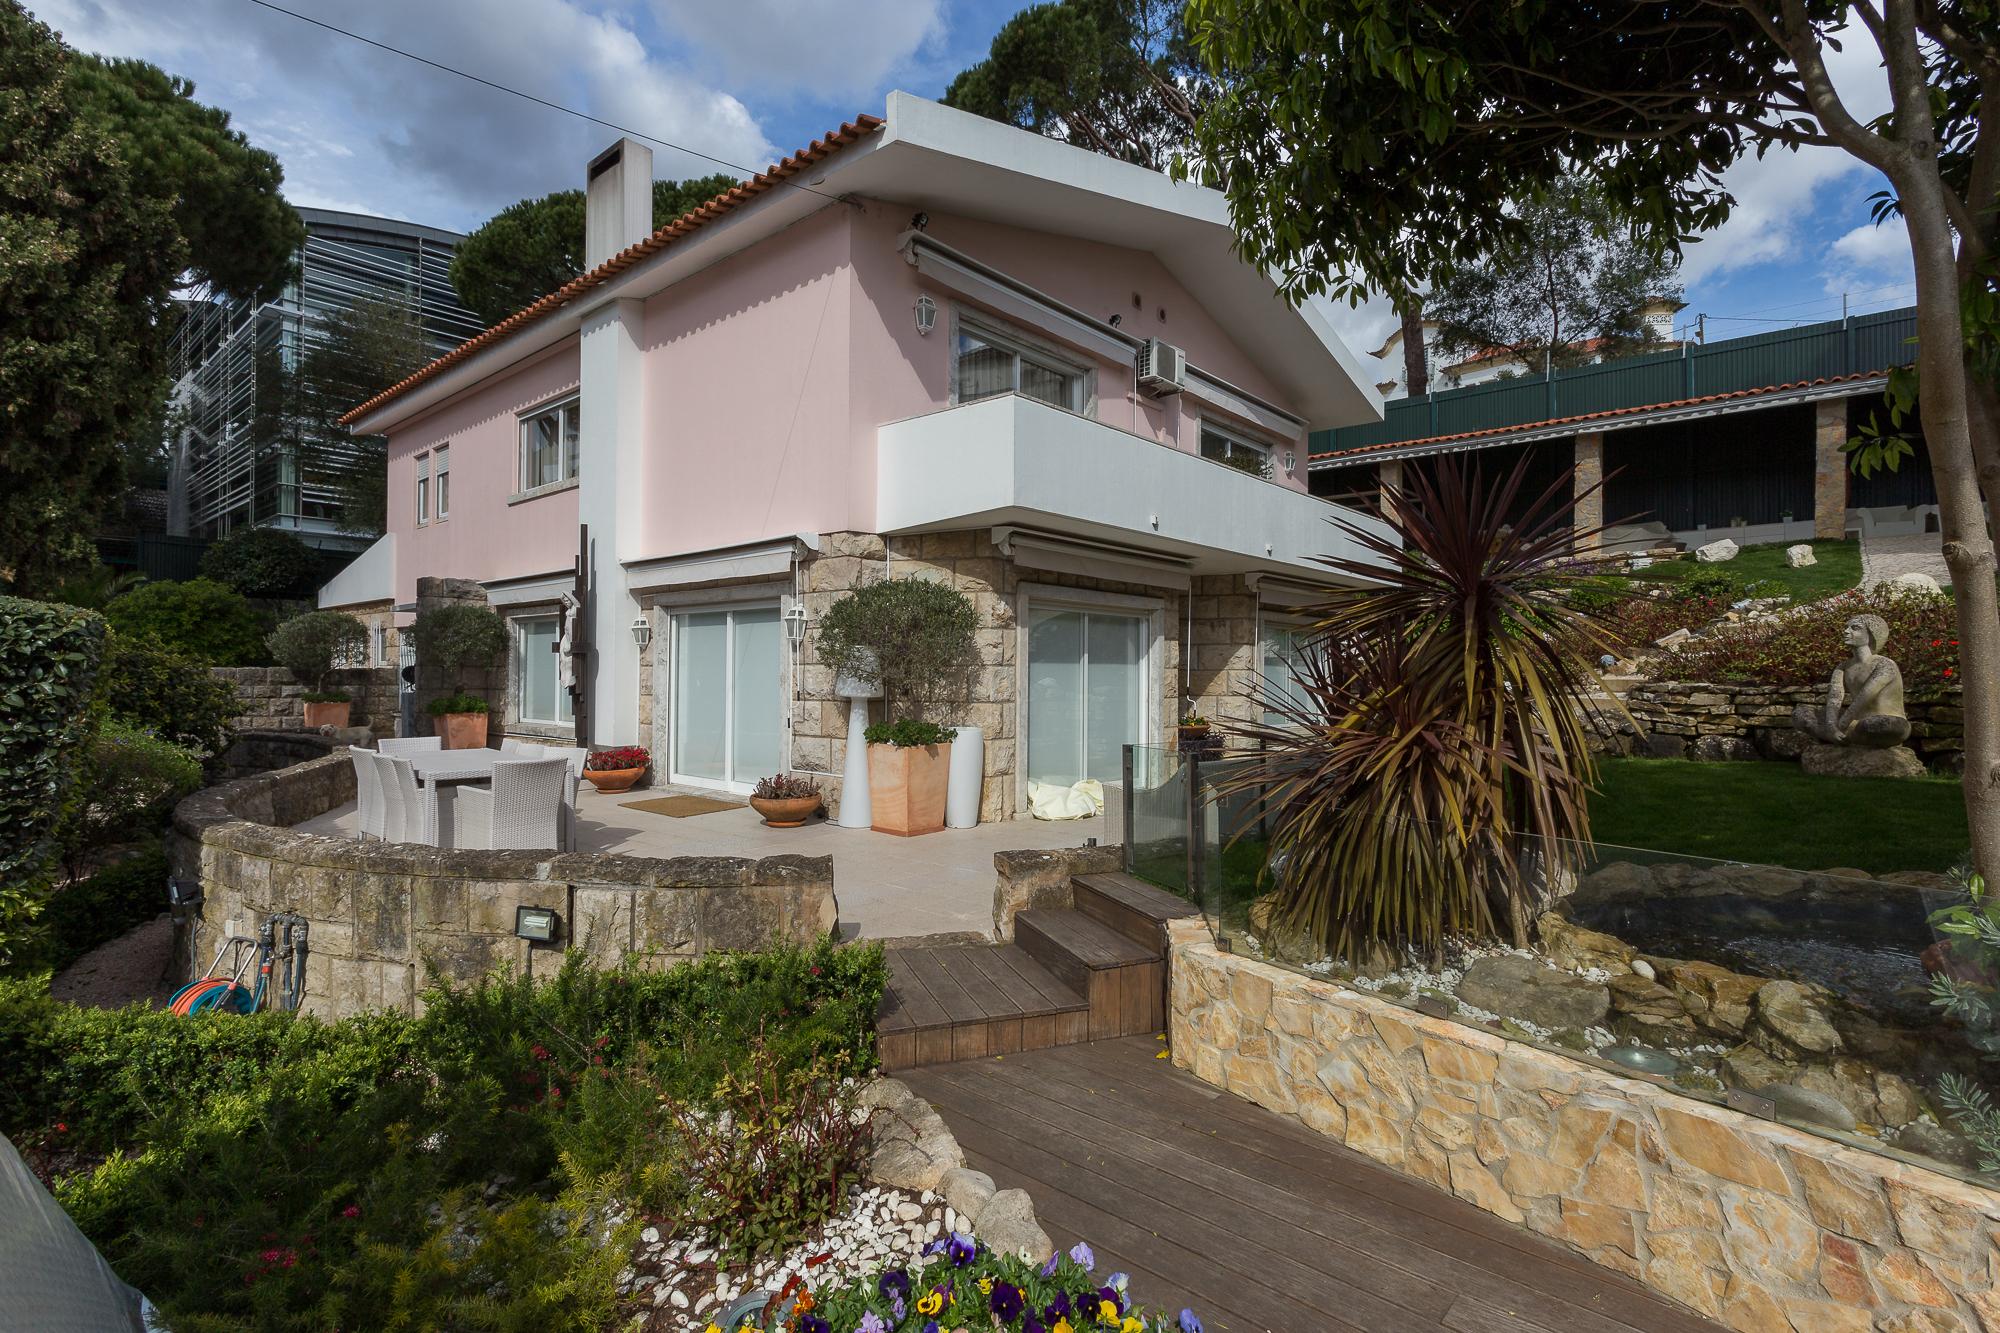 la r gion de l 39 algarve investir dans l 39 immobilier au portugal. Black Bedroom Furniture Sets. Home Design Ideas